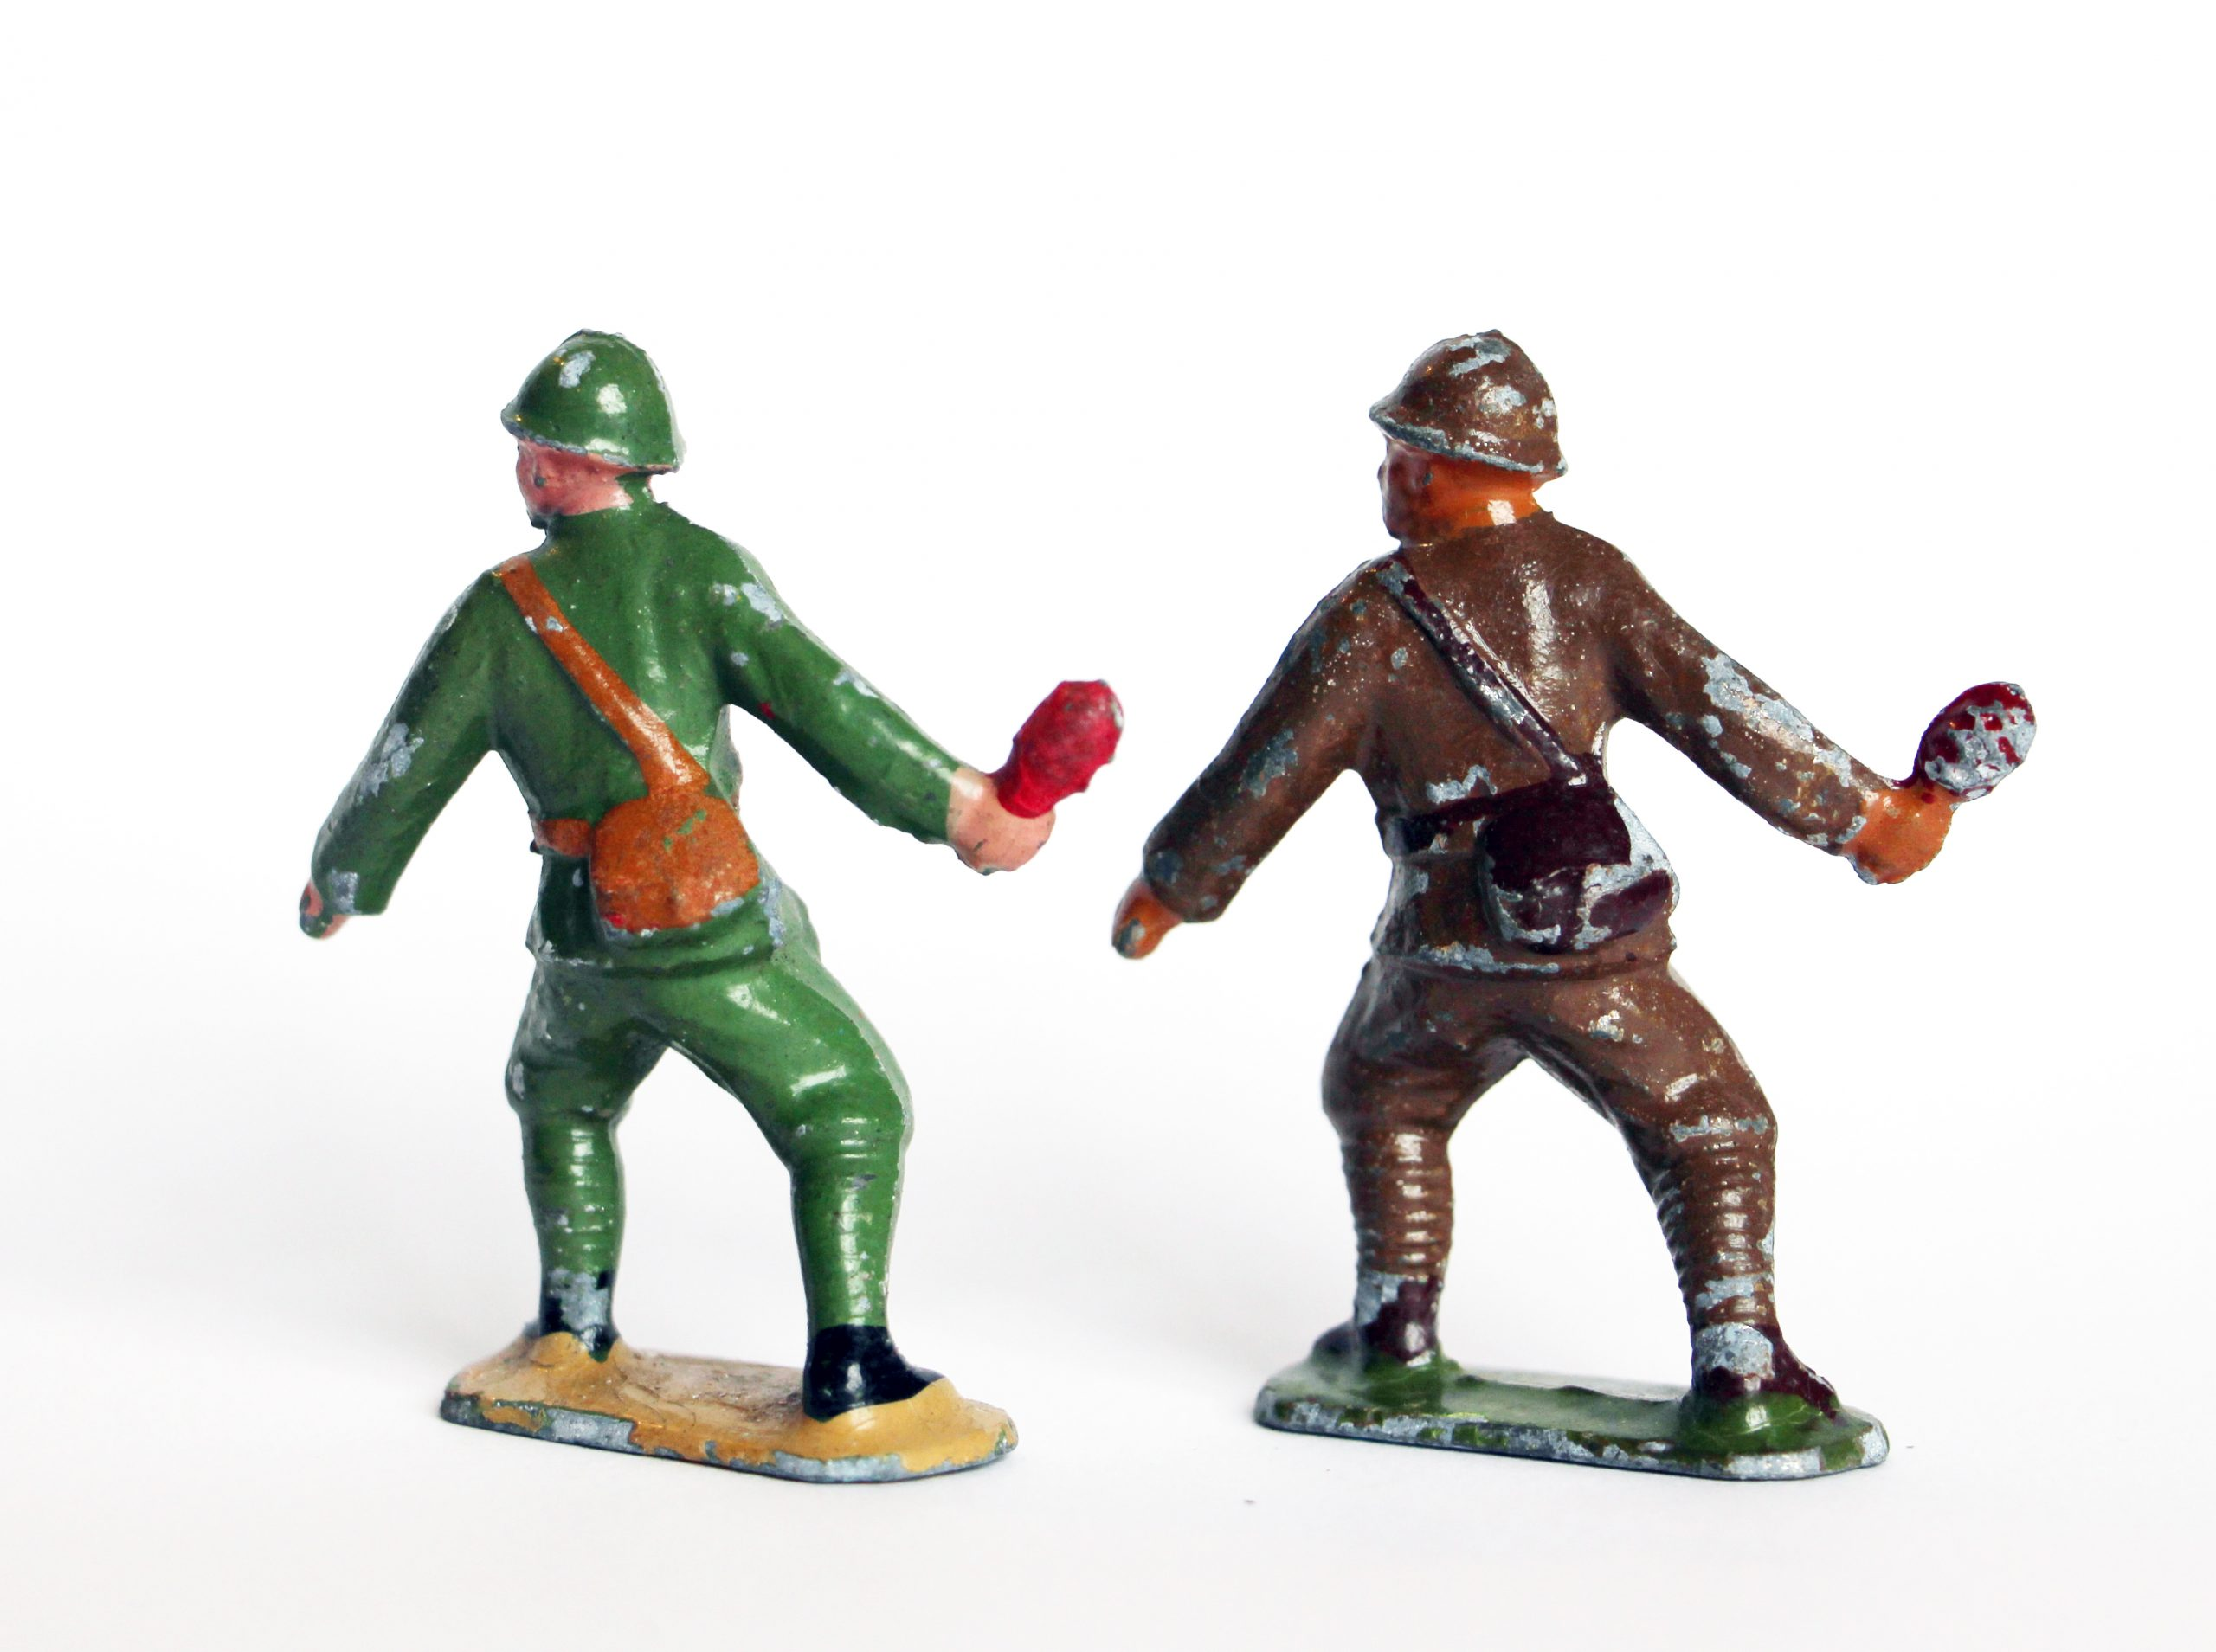 2 Figurines Plomb Creux - Grenadiers - Repeintes